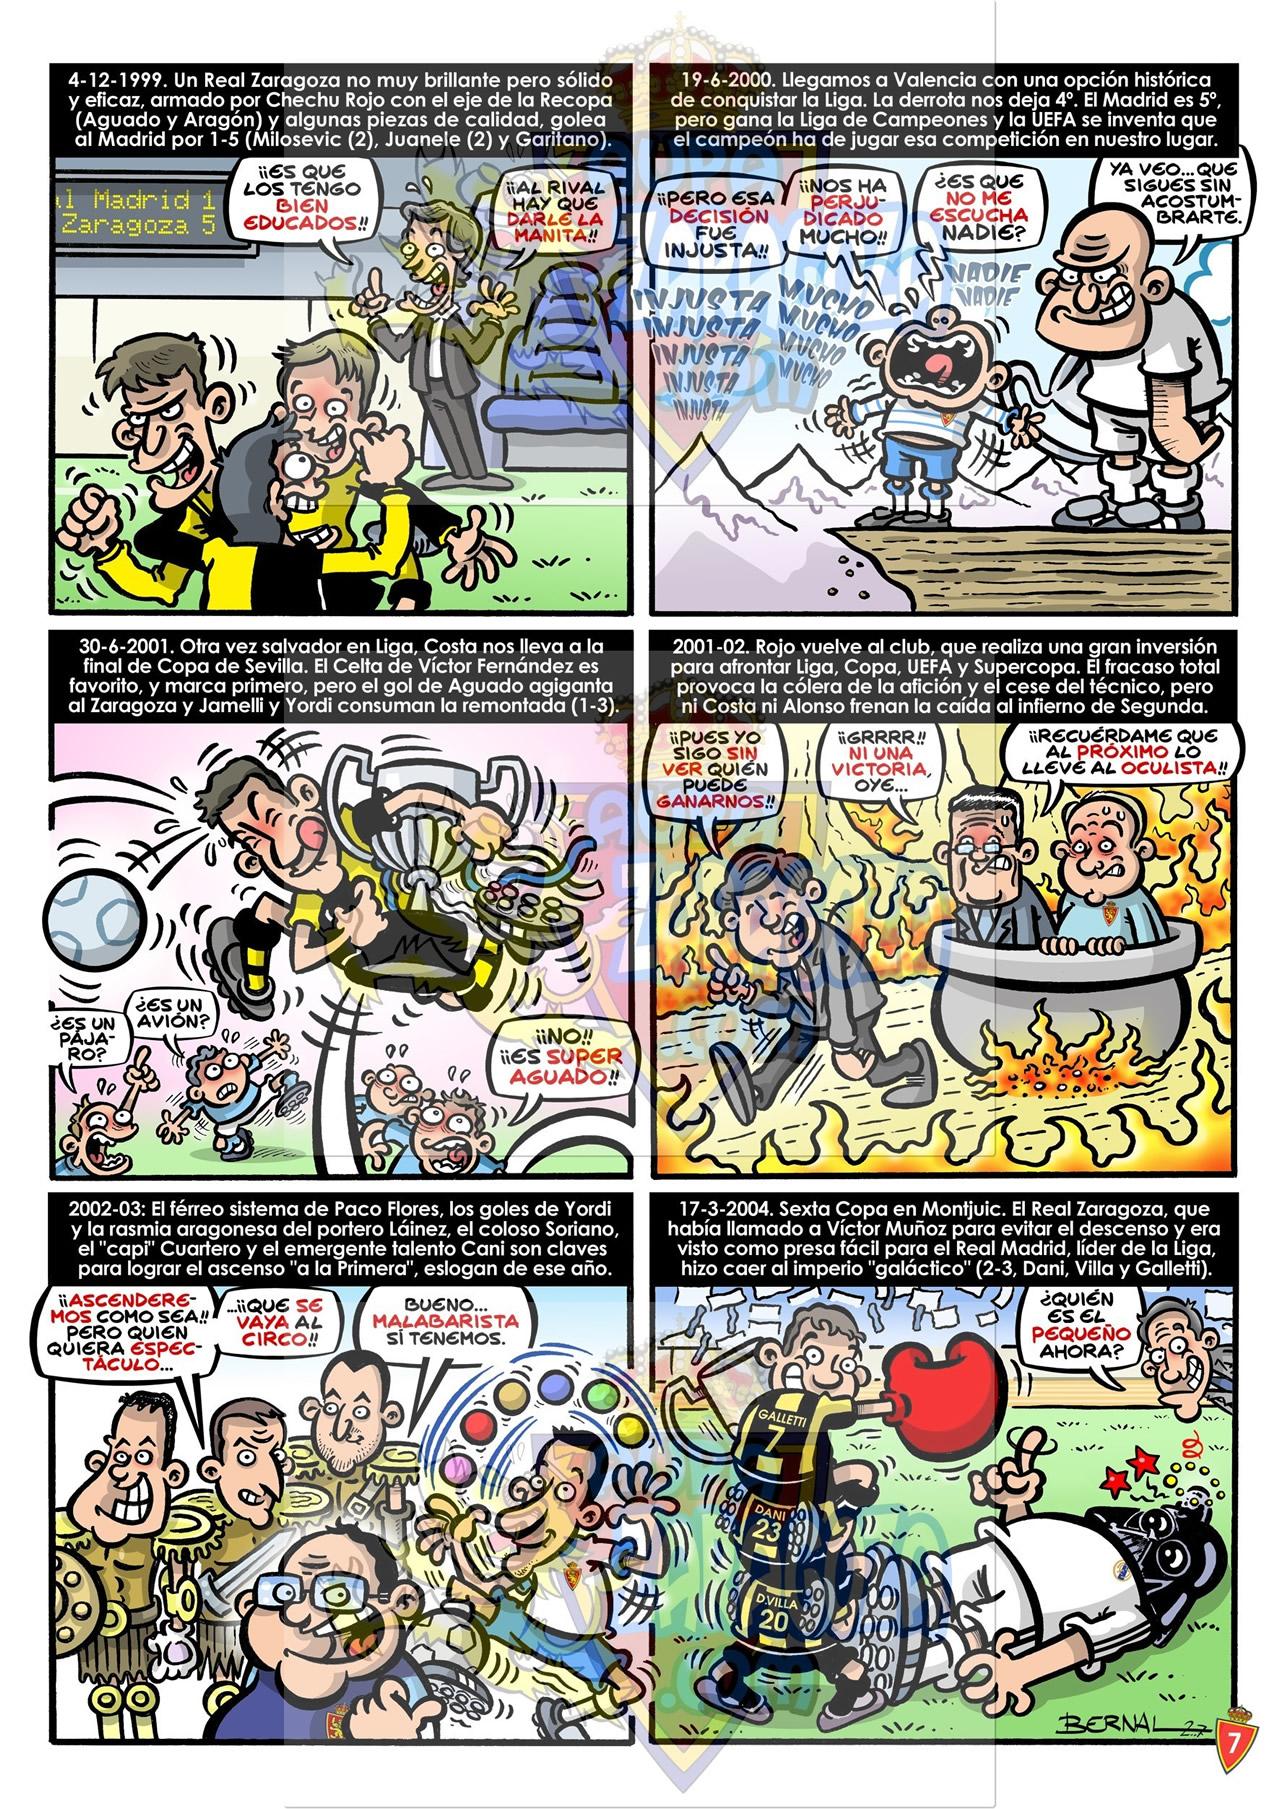 comic 75 años real zaragoza 7